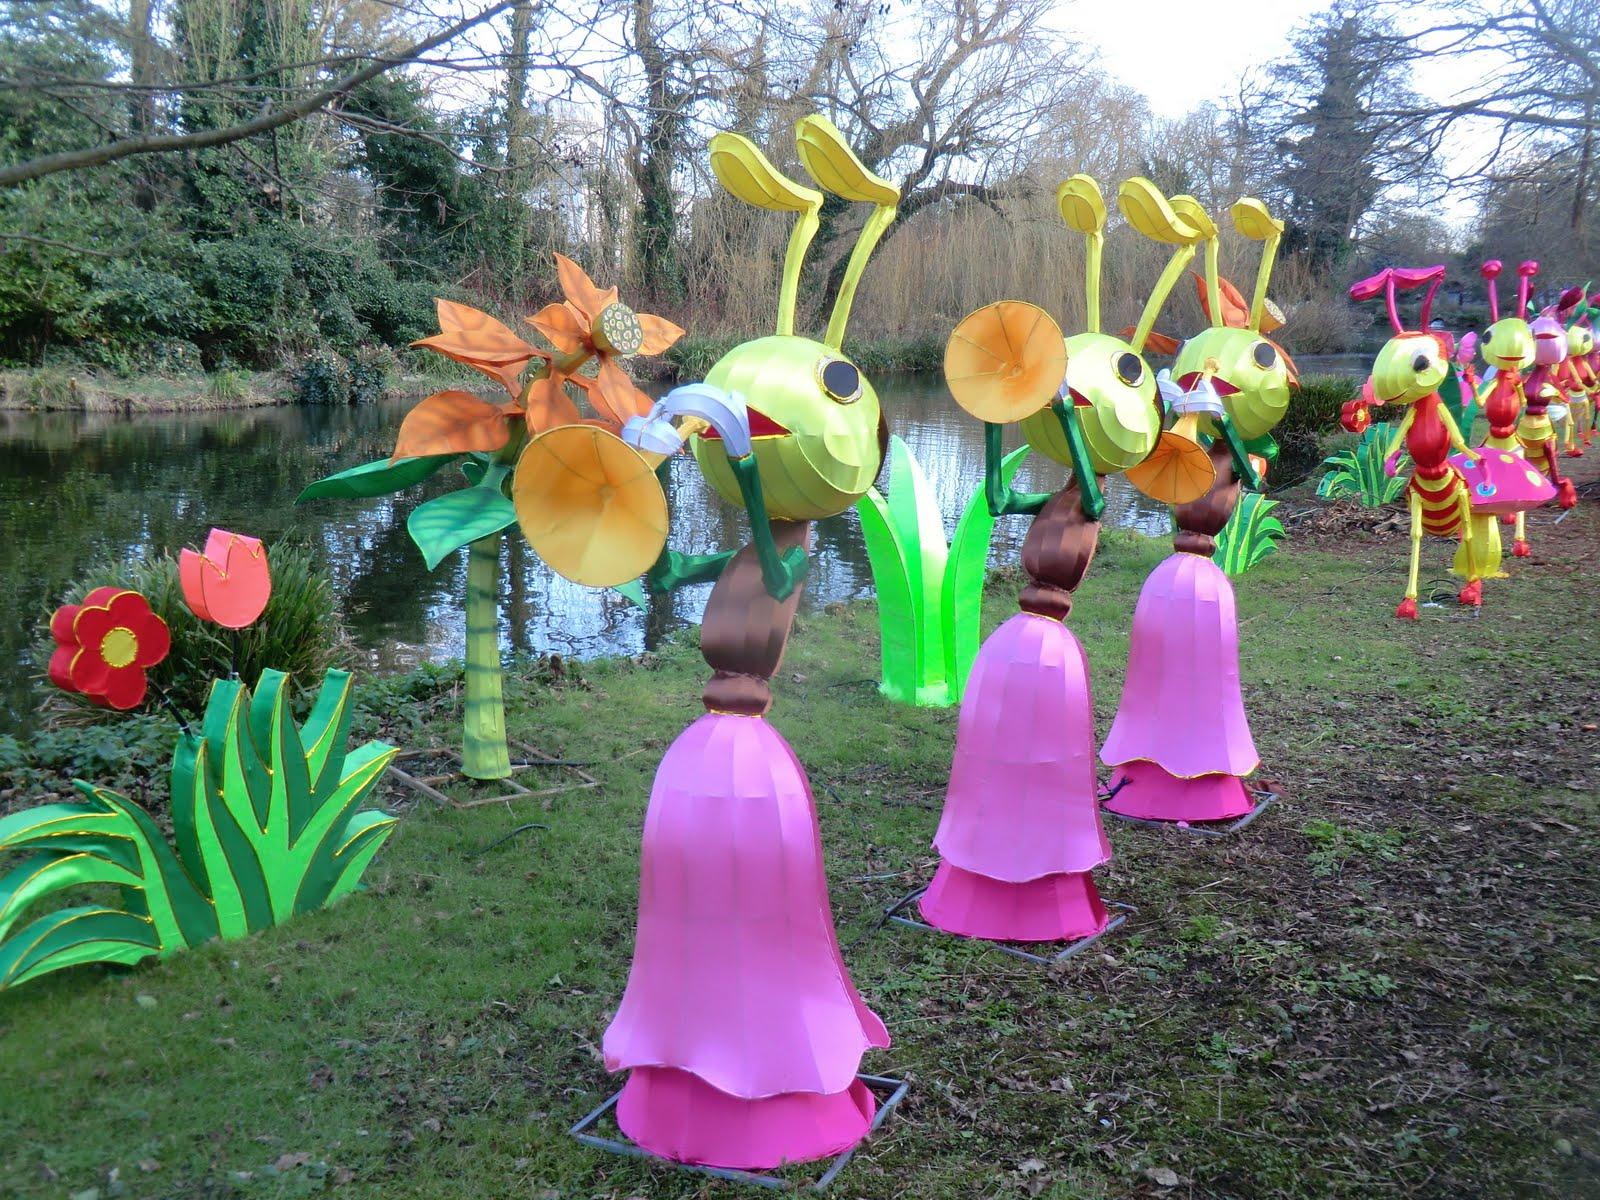 CIMG2532 Magical Lantern Festival 2016, Chiswick House